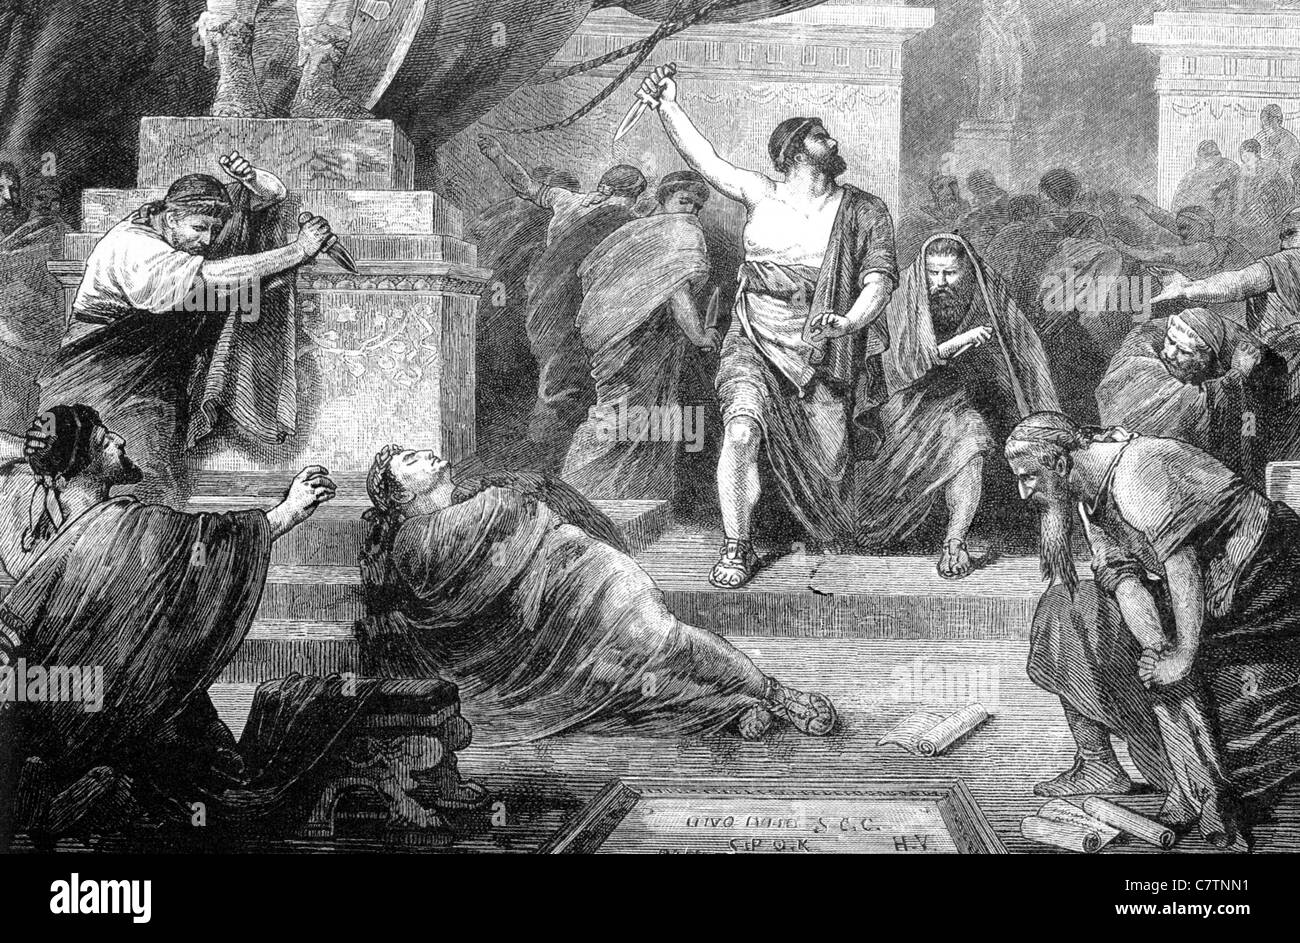 ASSASSINATION OF JULIUS CAESAR  44BC in a 19th century engraving - Stock Image